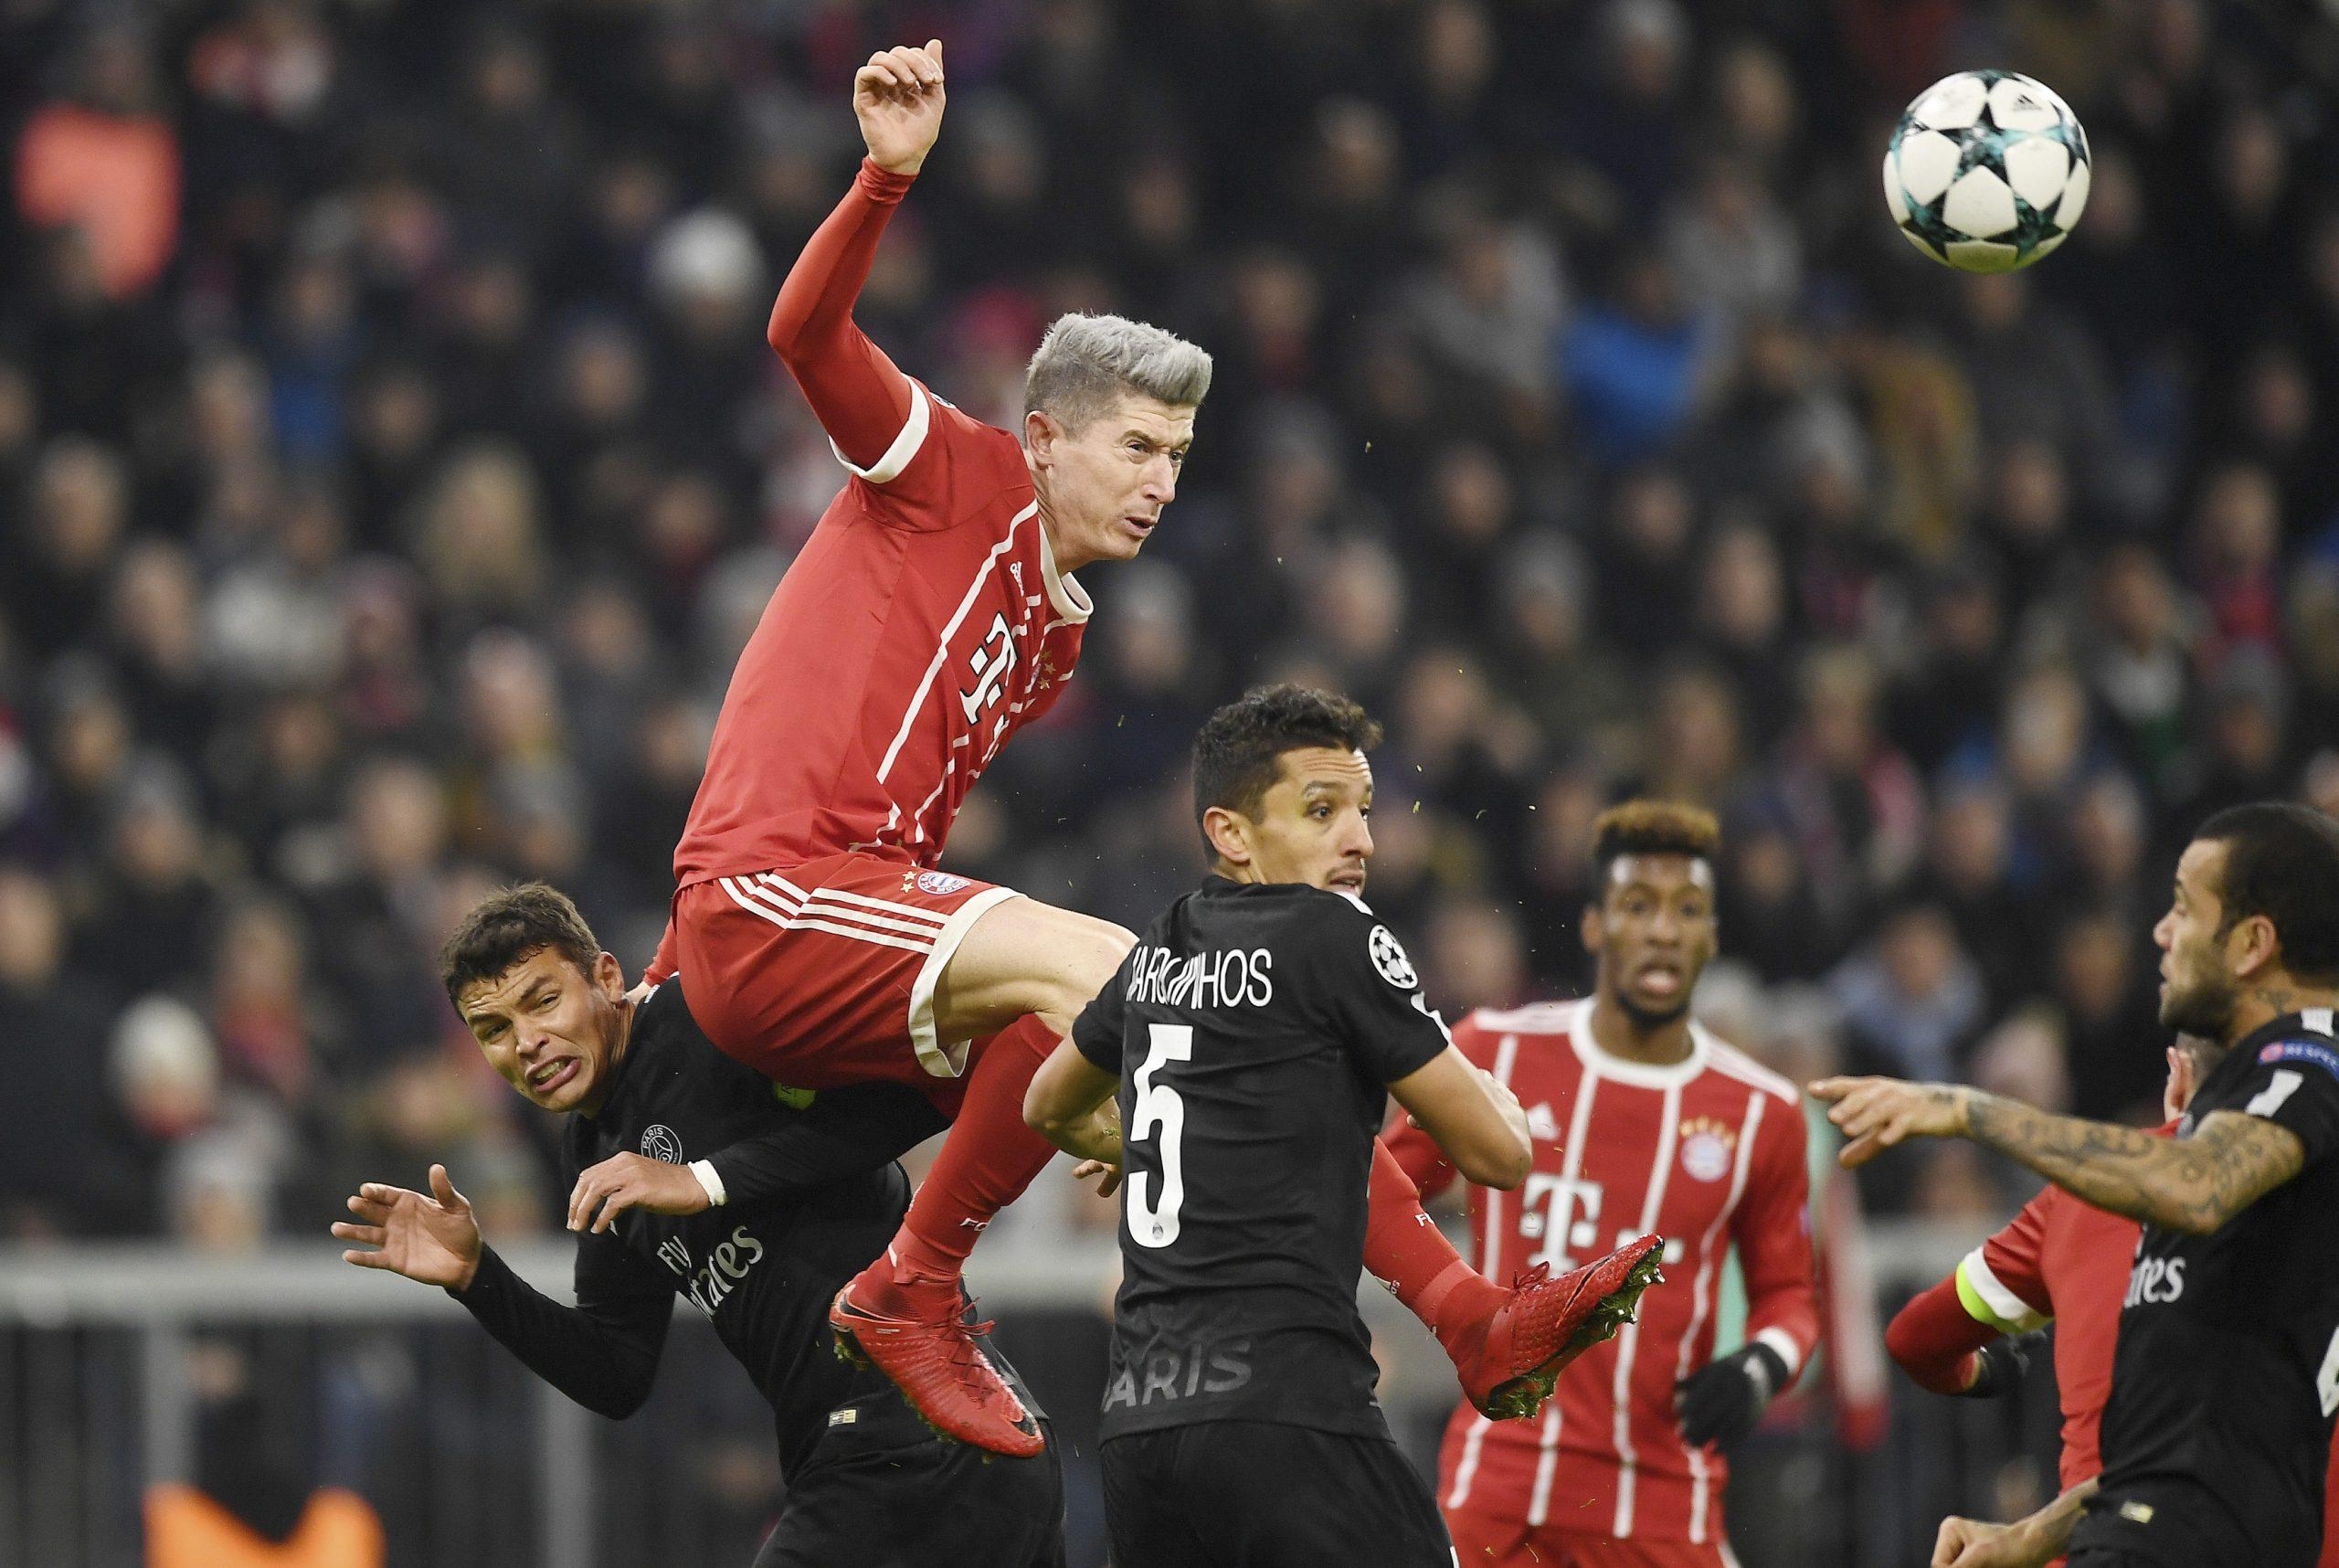 Bayern Munich vs PSG live stream